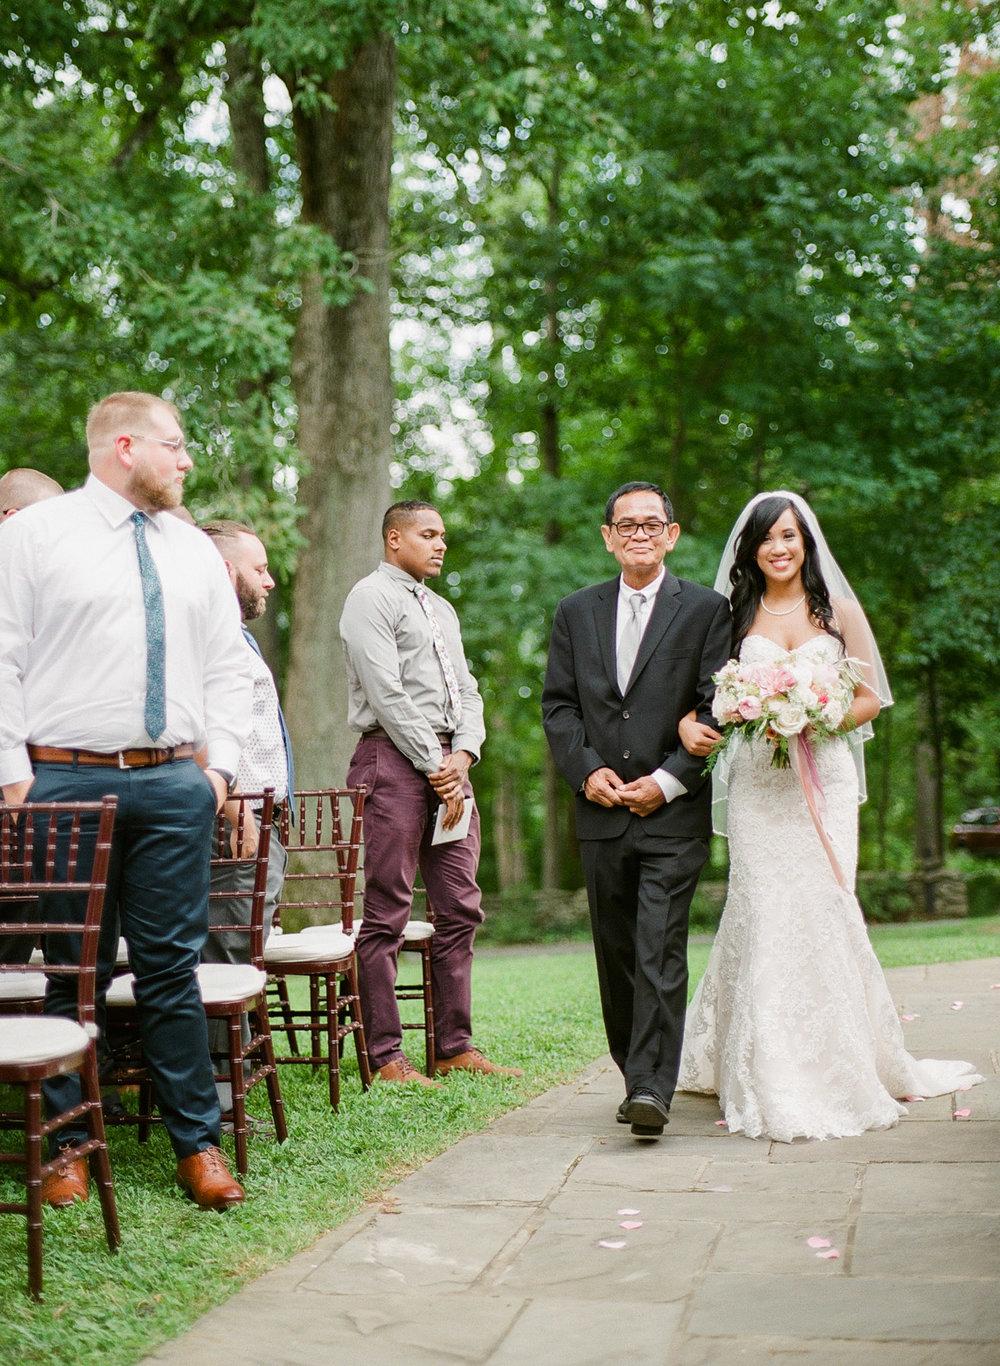 Virginia-Film-Photographer-Wedding-43.jpg